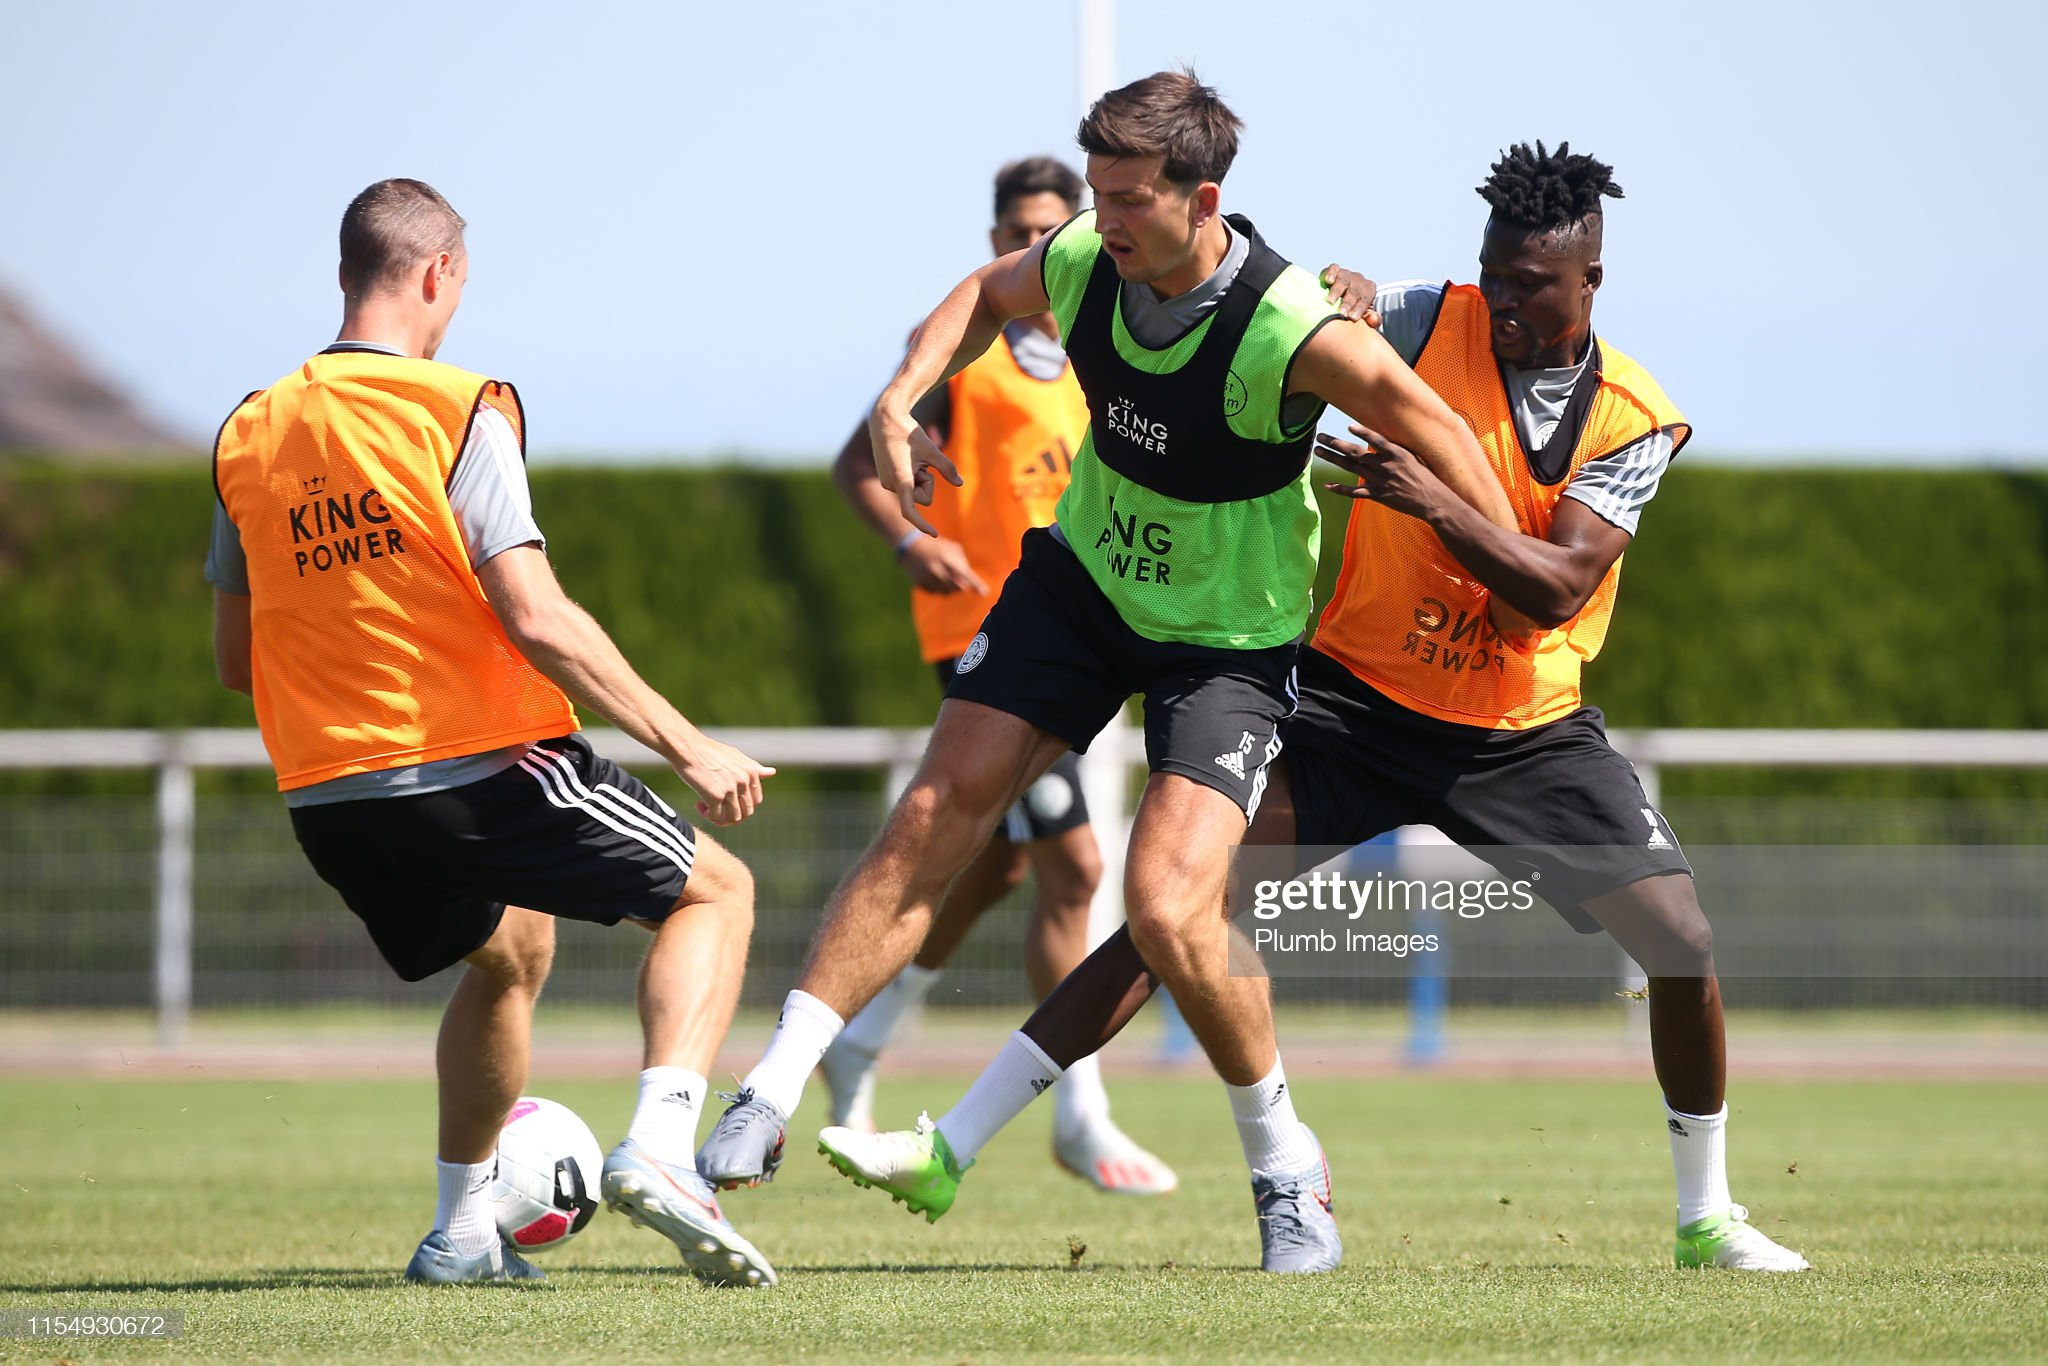 Leicester City Pre-Season Training Camp - Day 3 : News Photo